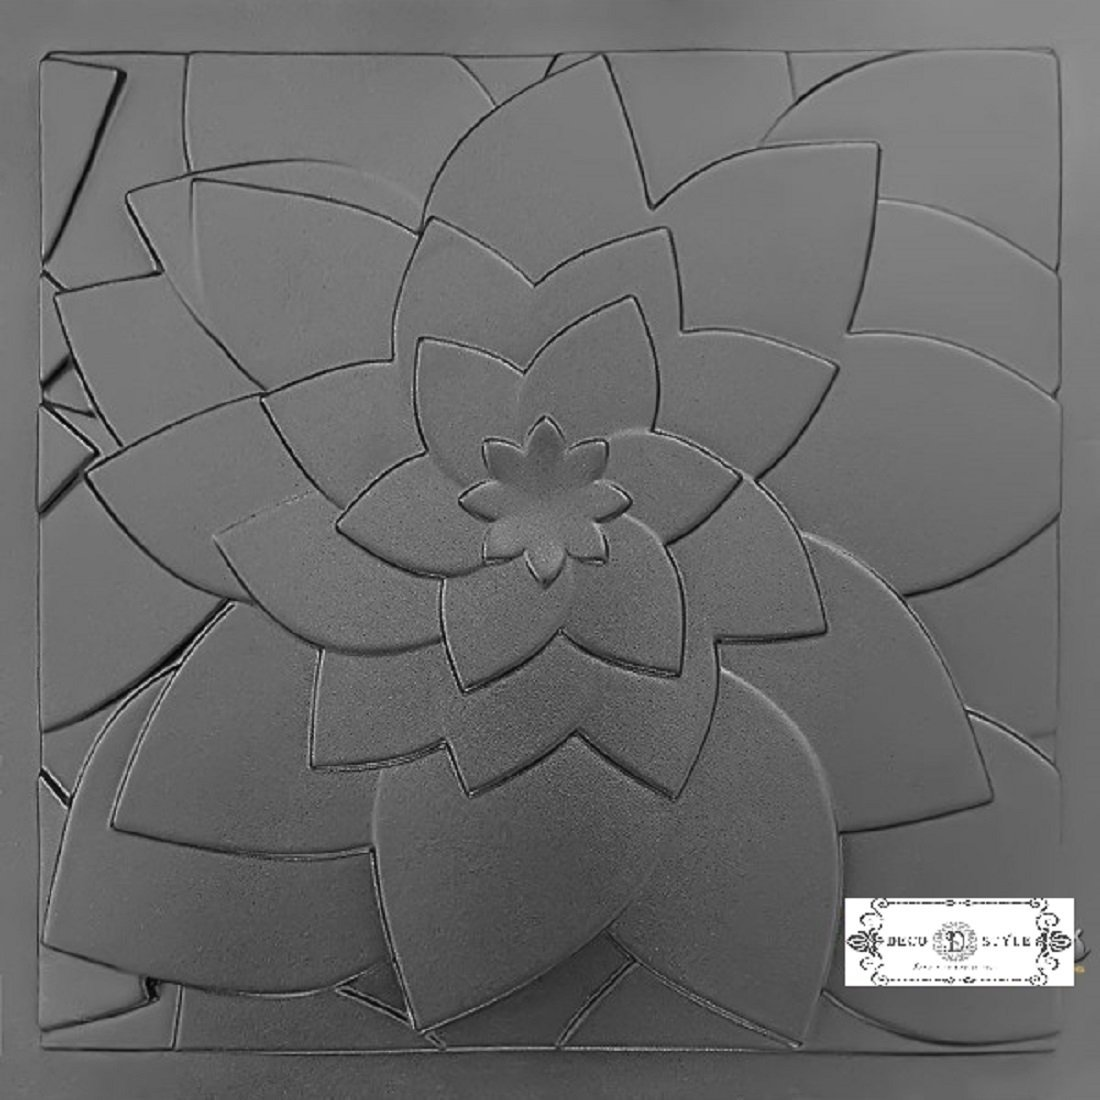 Lotus Plastic Molds For 3 D Panels Plaster Wall Stone Form 3D Decor Wall Panels Art Decor Decorative Wall Tile Panels